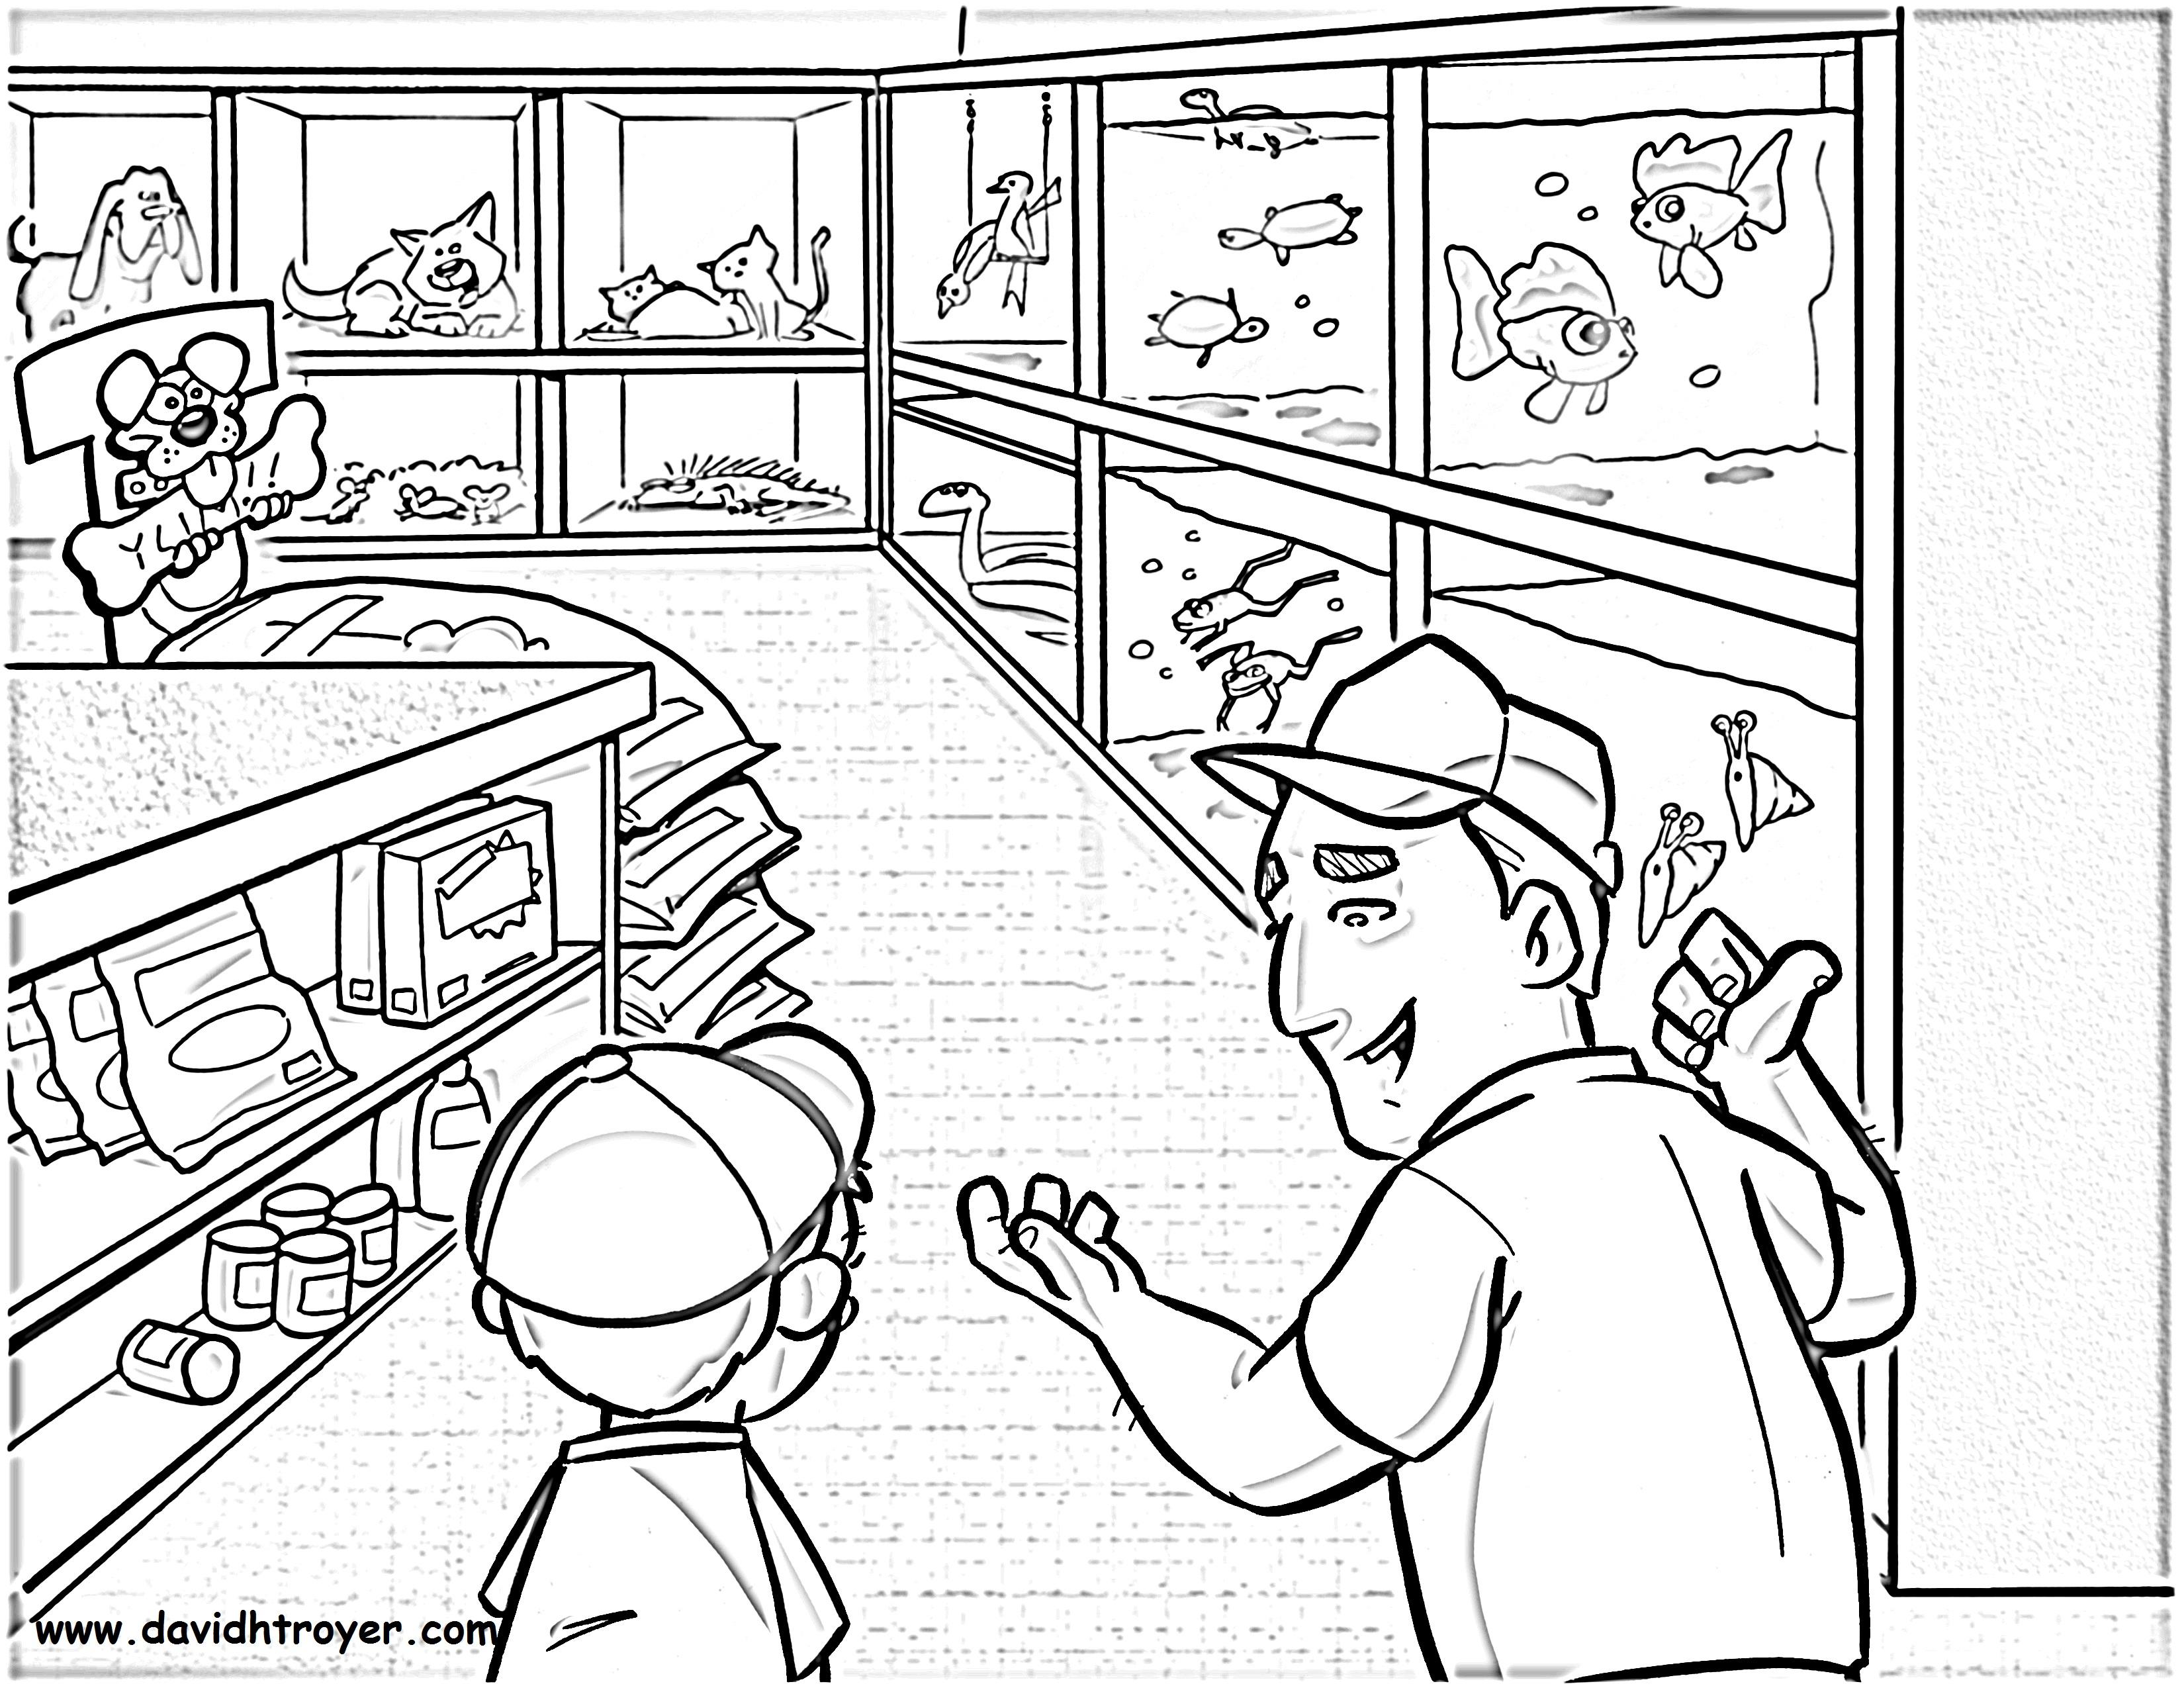 Shop coloring #3, Download drawings